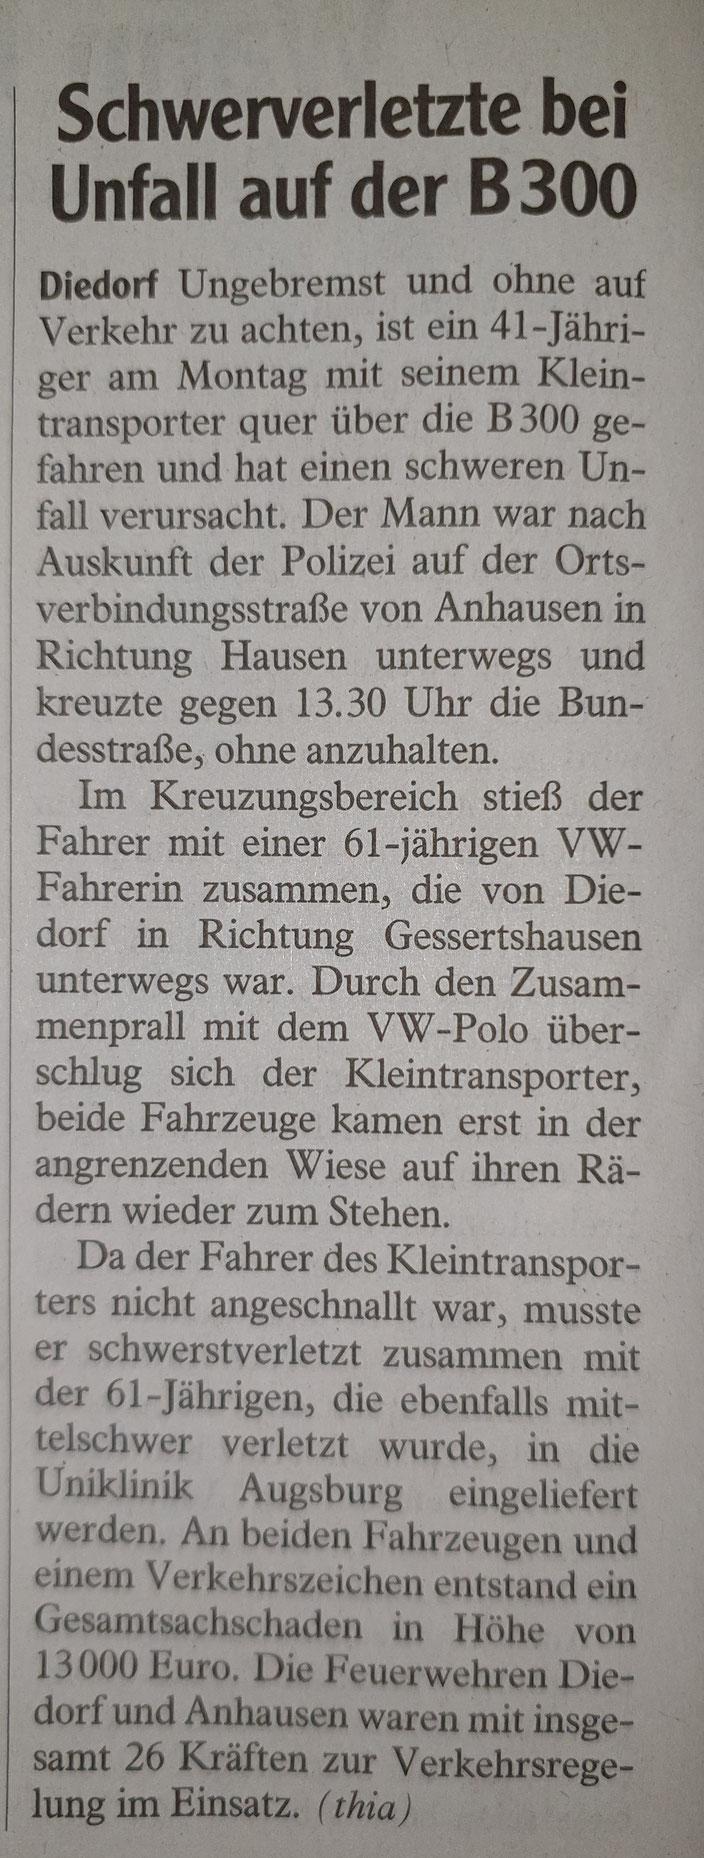 Augsburger Allgemeine, 29. April 2020